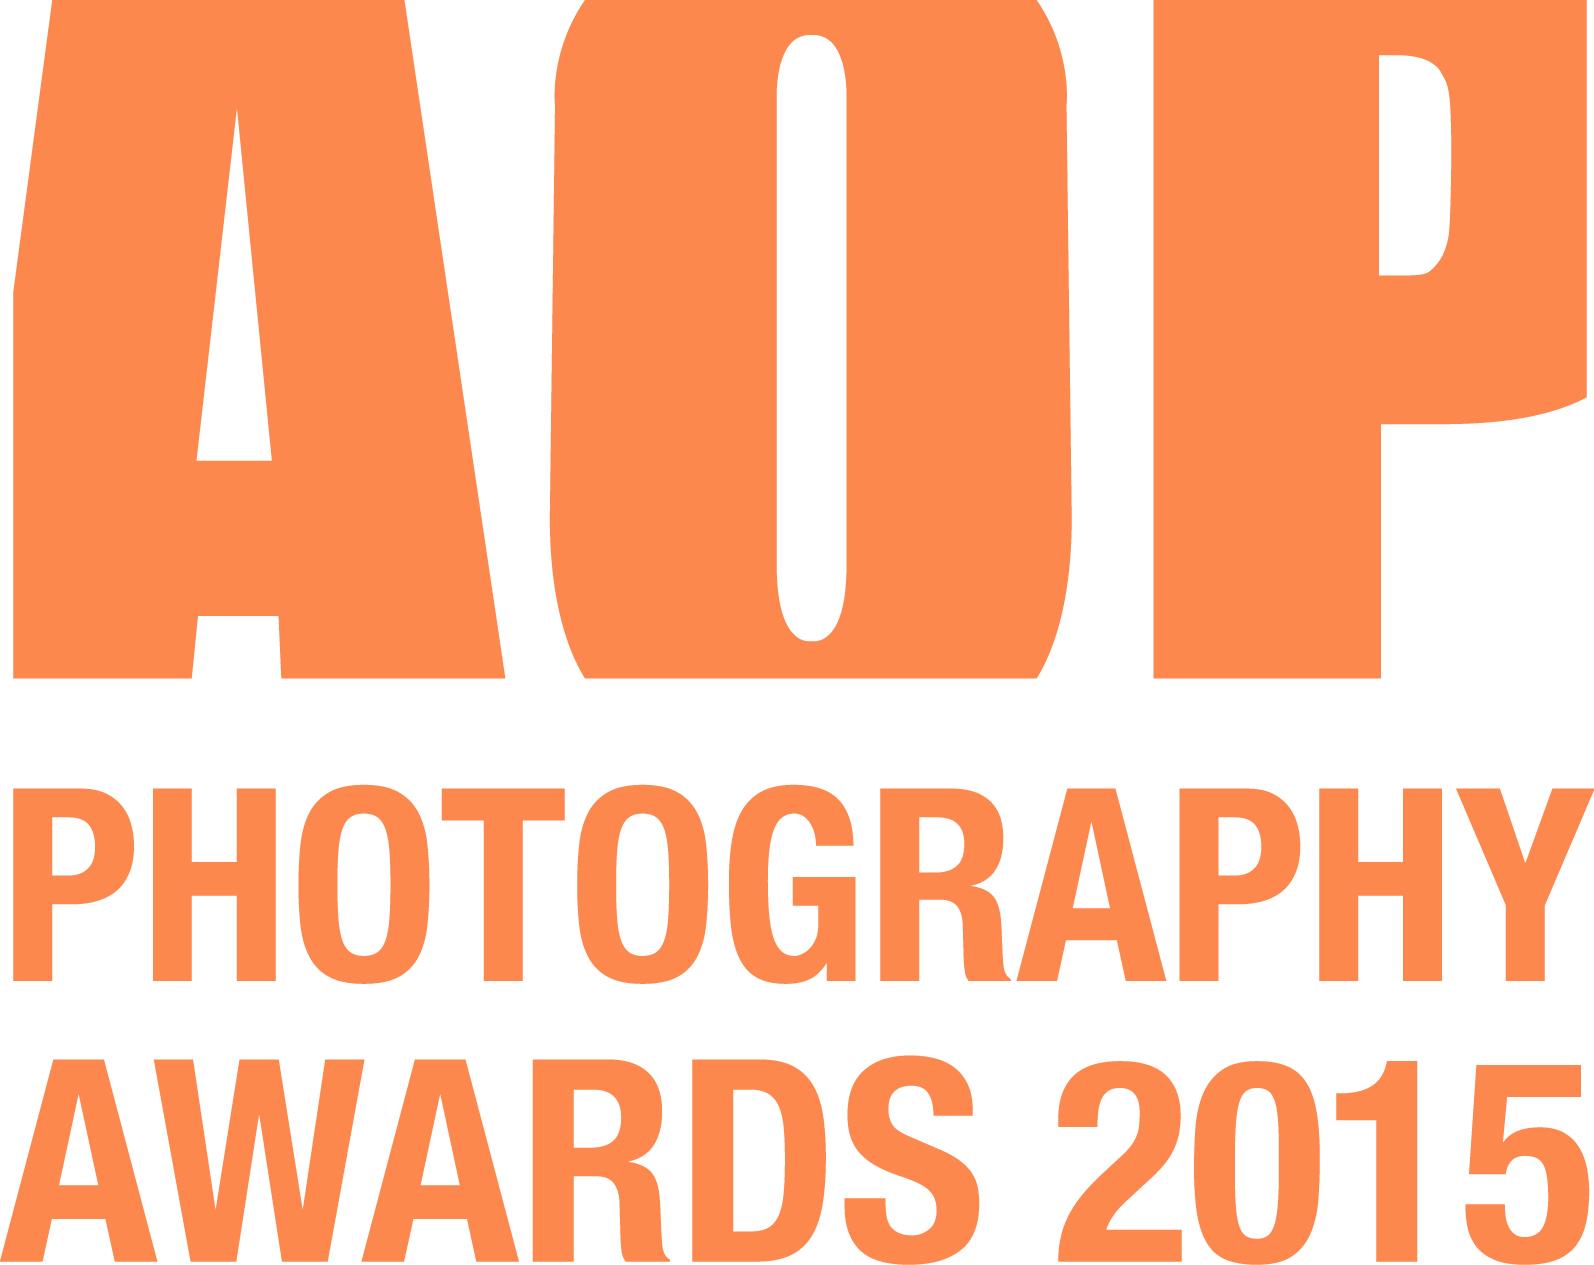 AOP photography Award 2015 Orange PC